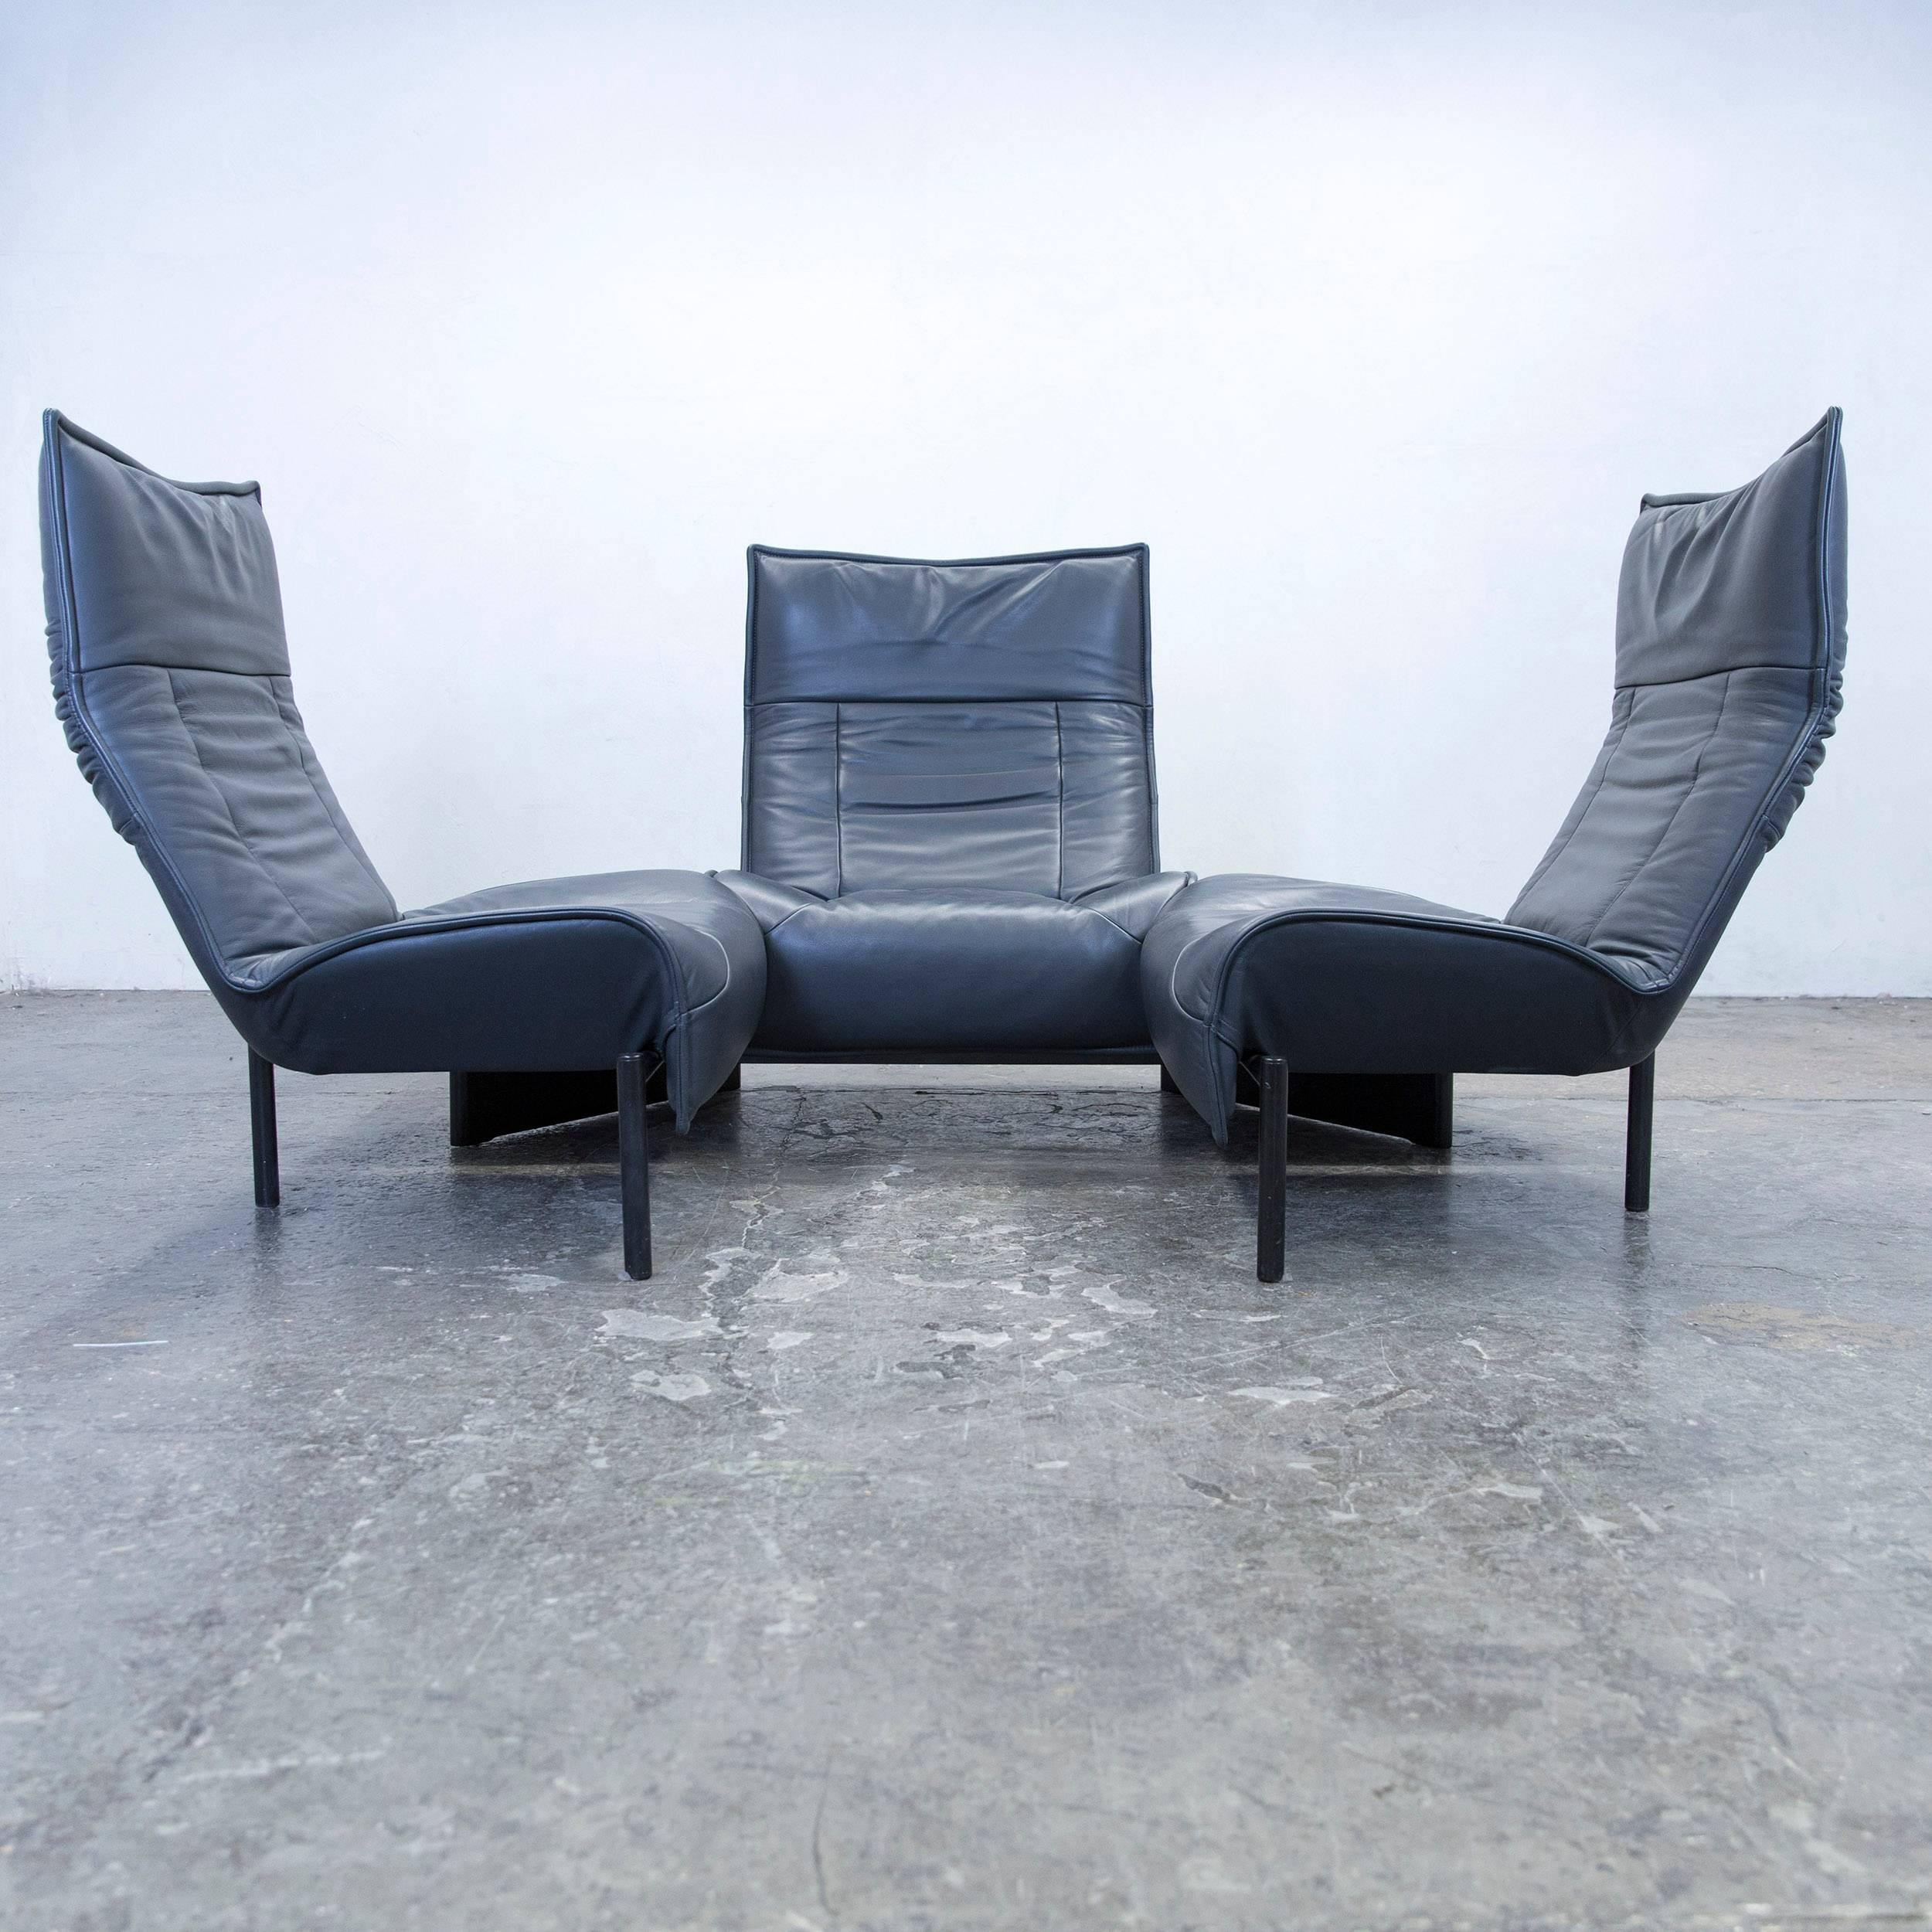 Faszinierend Couchgarnitur Mit Sessel Sammlung Von Affordable Latest Cassina Veranda Vico Magistretti Sofa